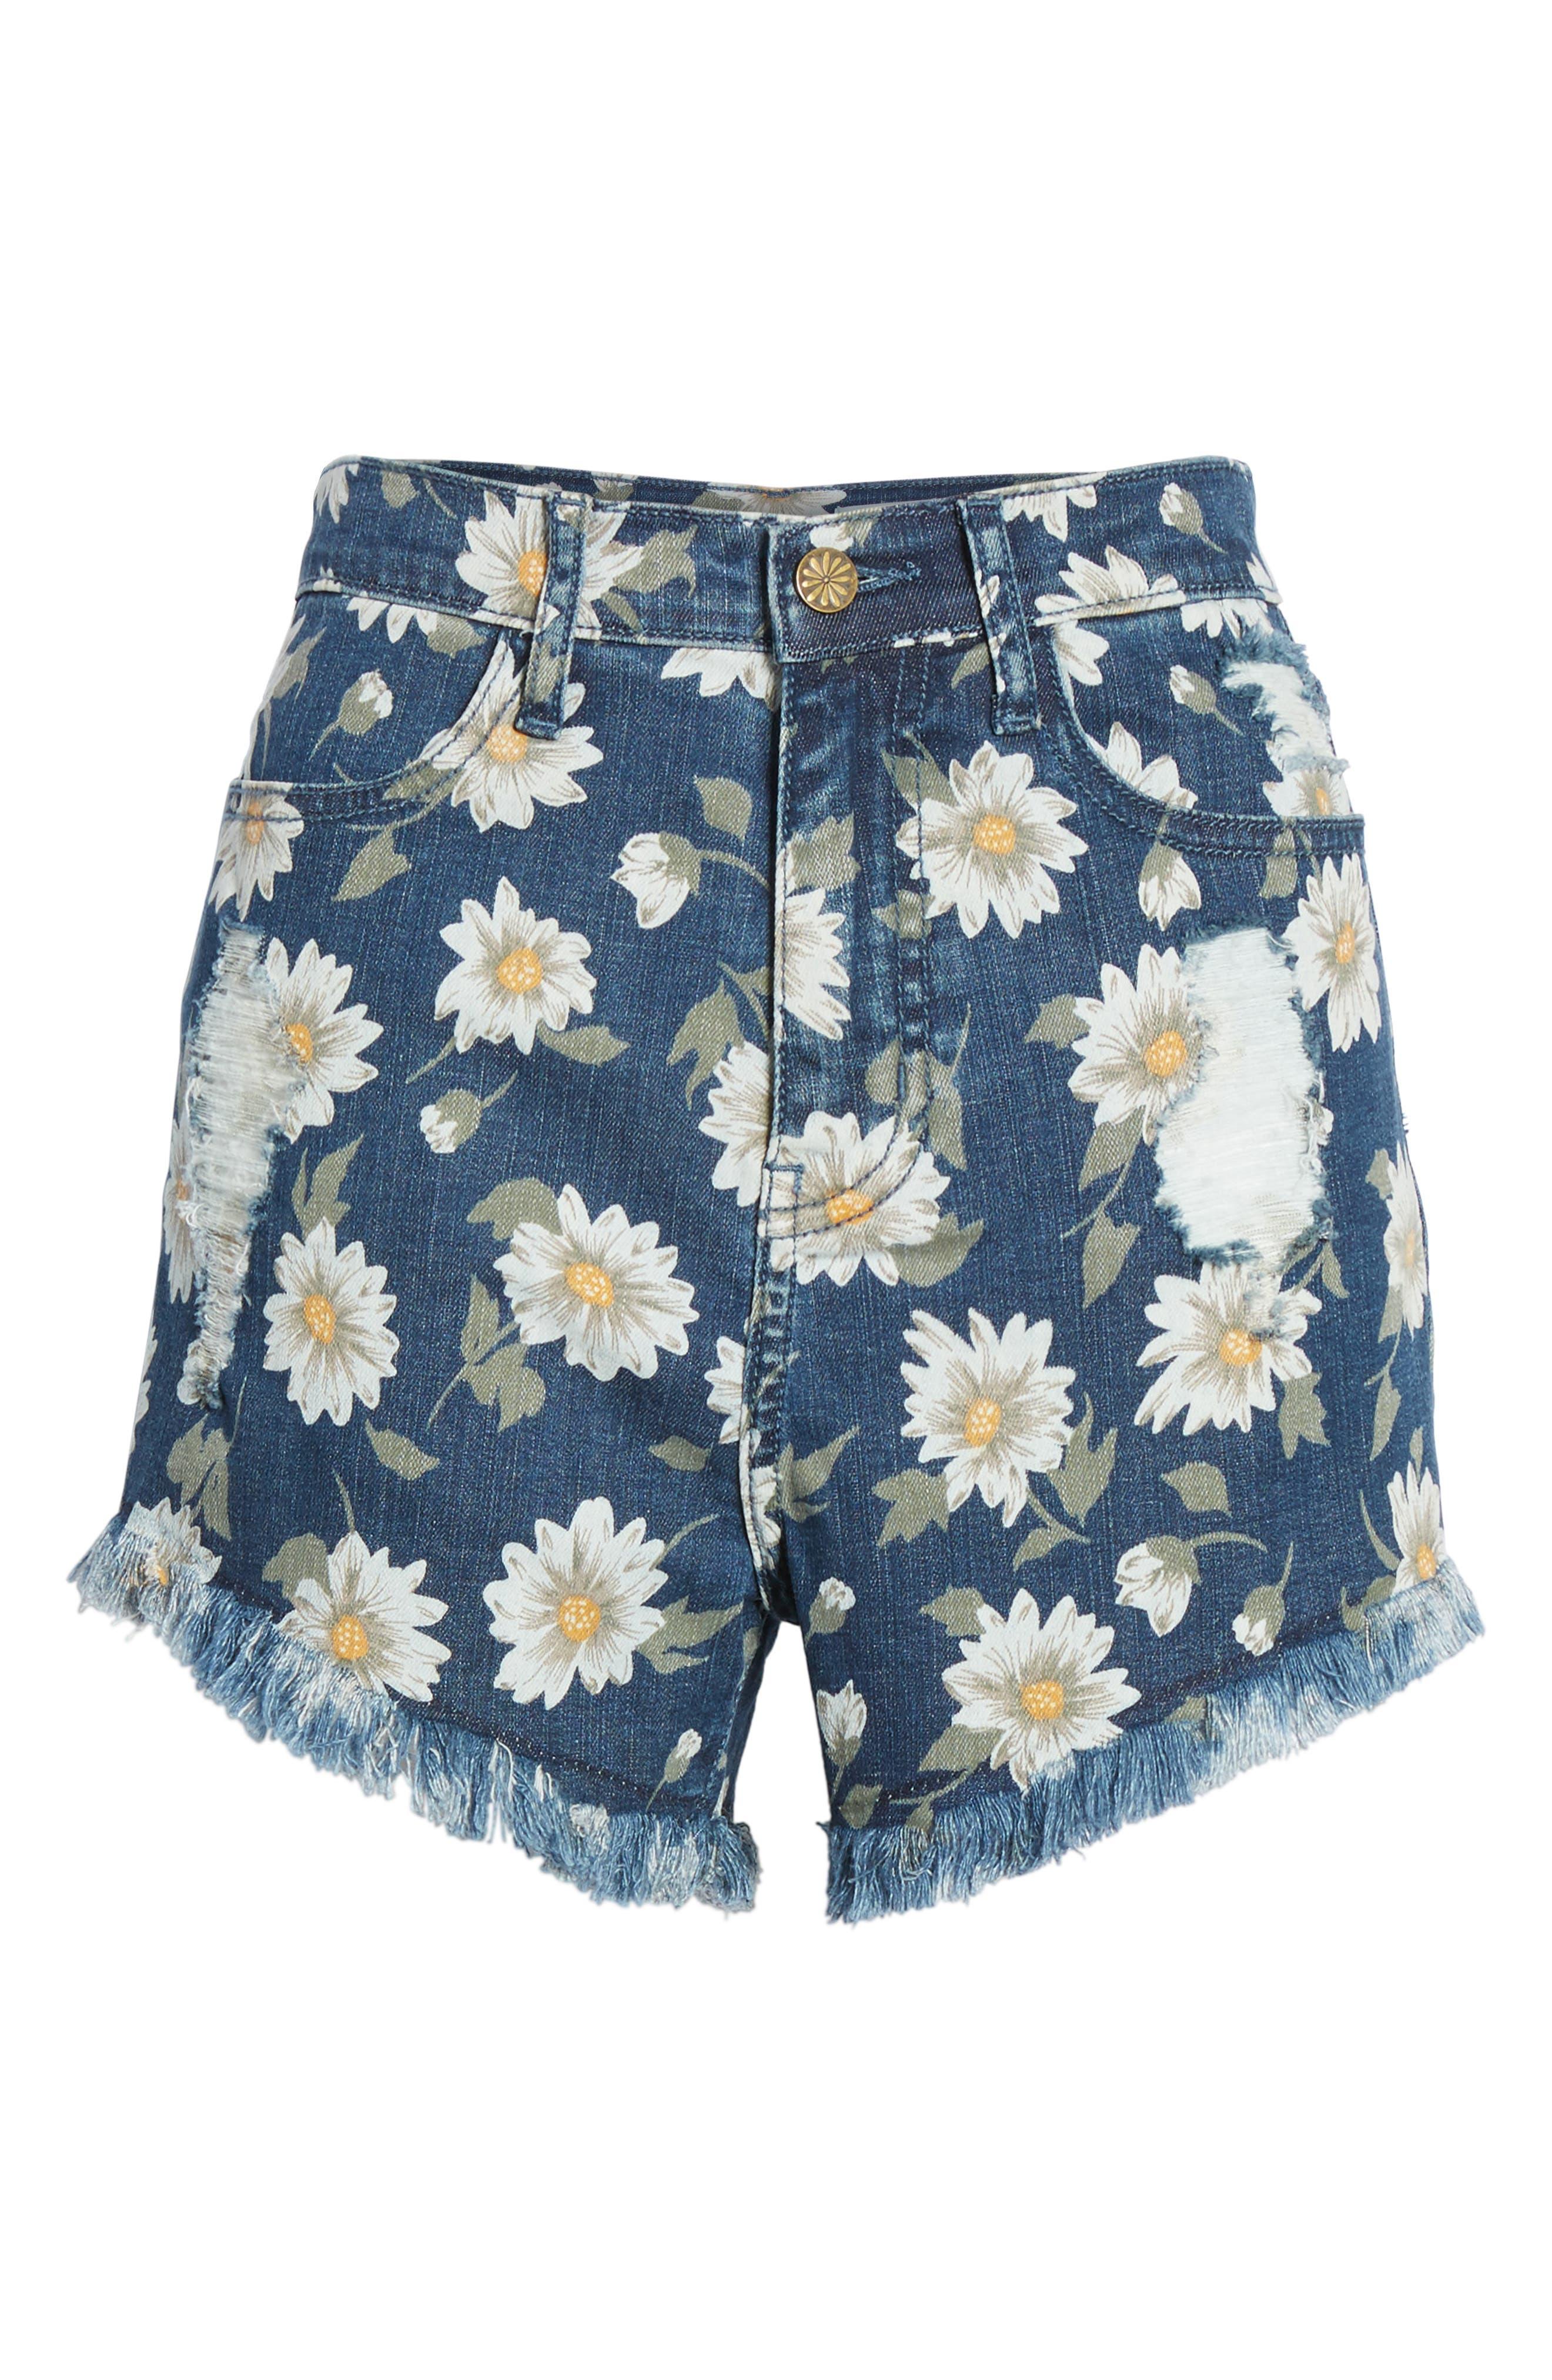 Toledo High Waist Cutoff Denim Shorts,                             Alternate thumbnail 4, color,                             400